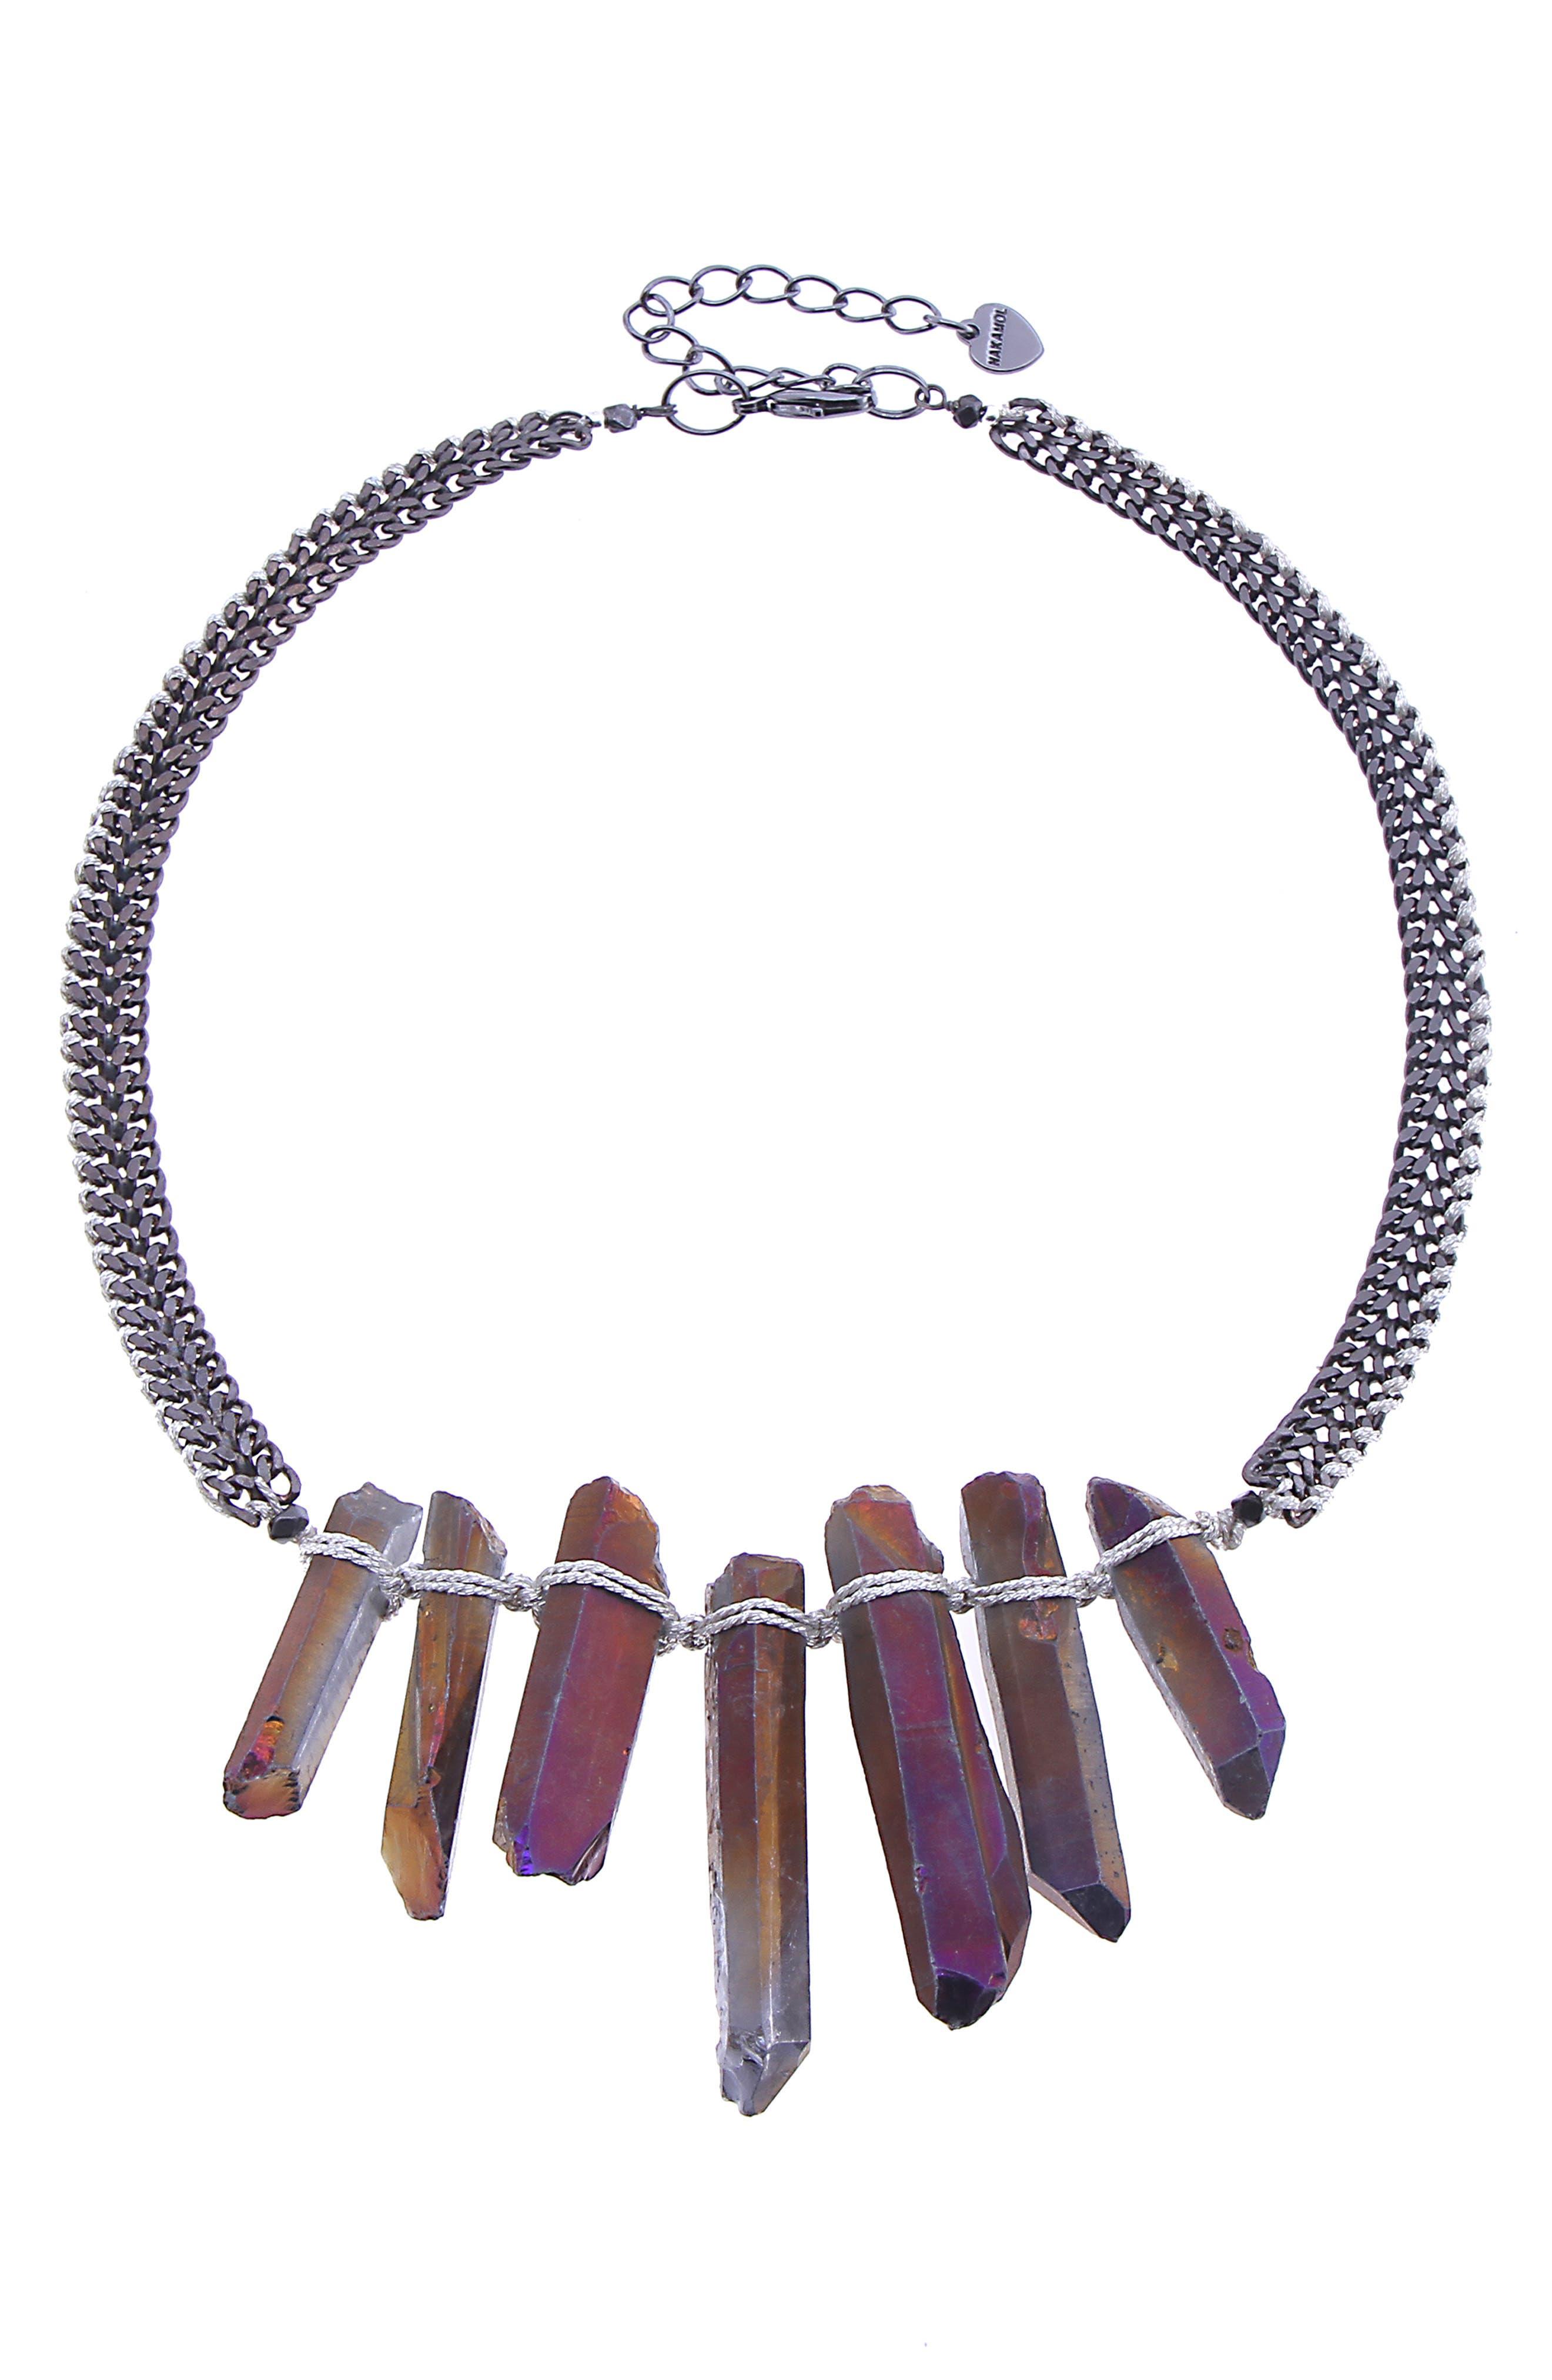 Amazonite Stick Statement Necklace,                             Main thumbnail 1, color,                             PURPLE